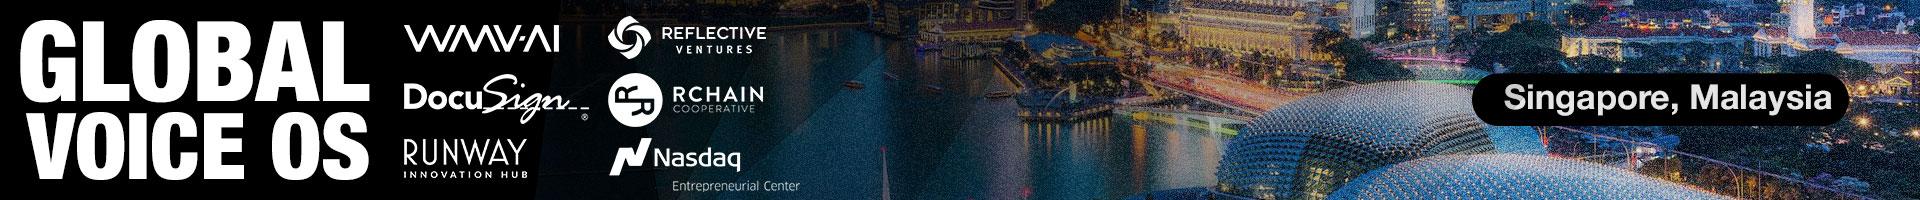 Event-Global-Voice-OS-1920x200-Singapore-Malaysia